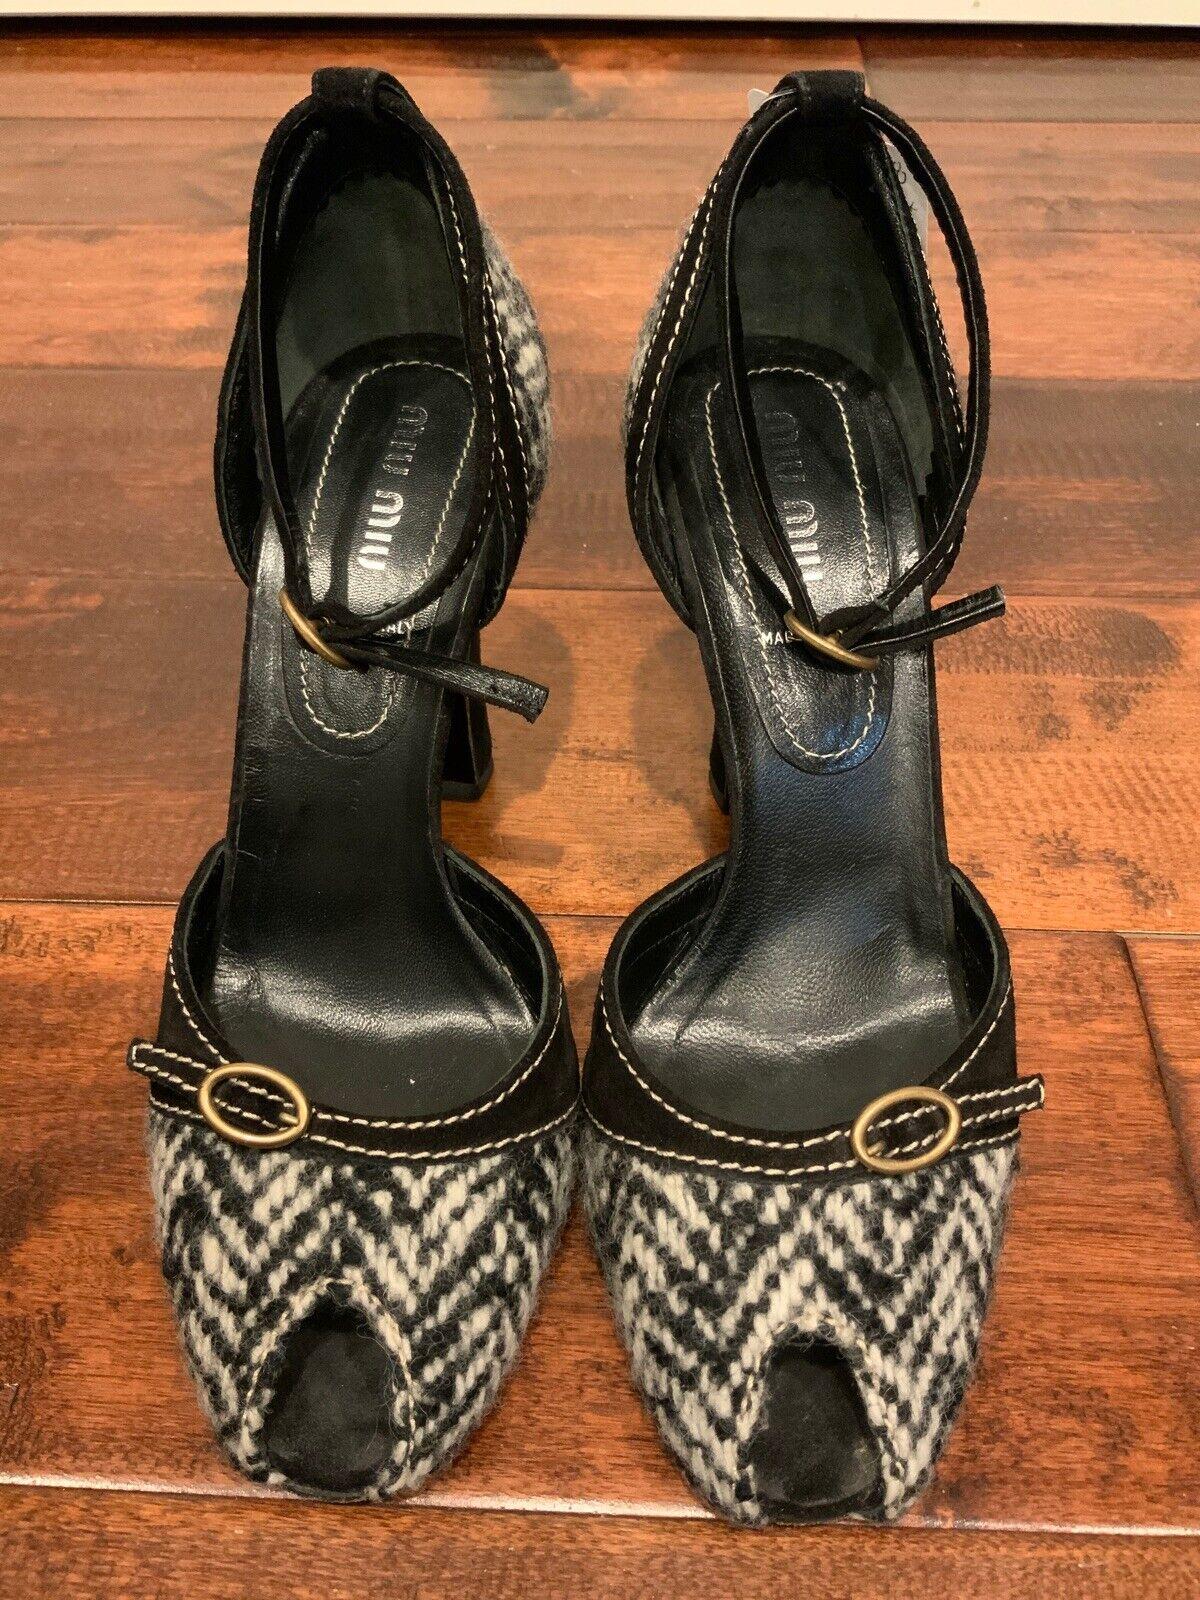 Miu Miu Black & White Tweed Peep Toe Heels, Size 36.5 (IT) 6.5 (US)